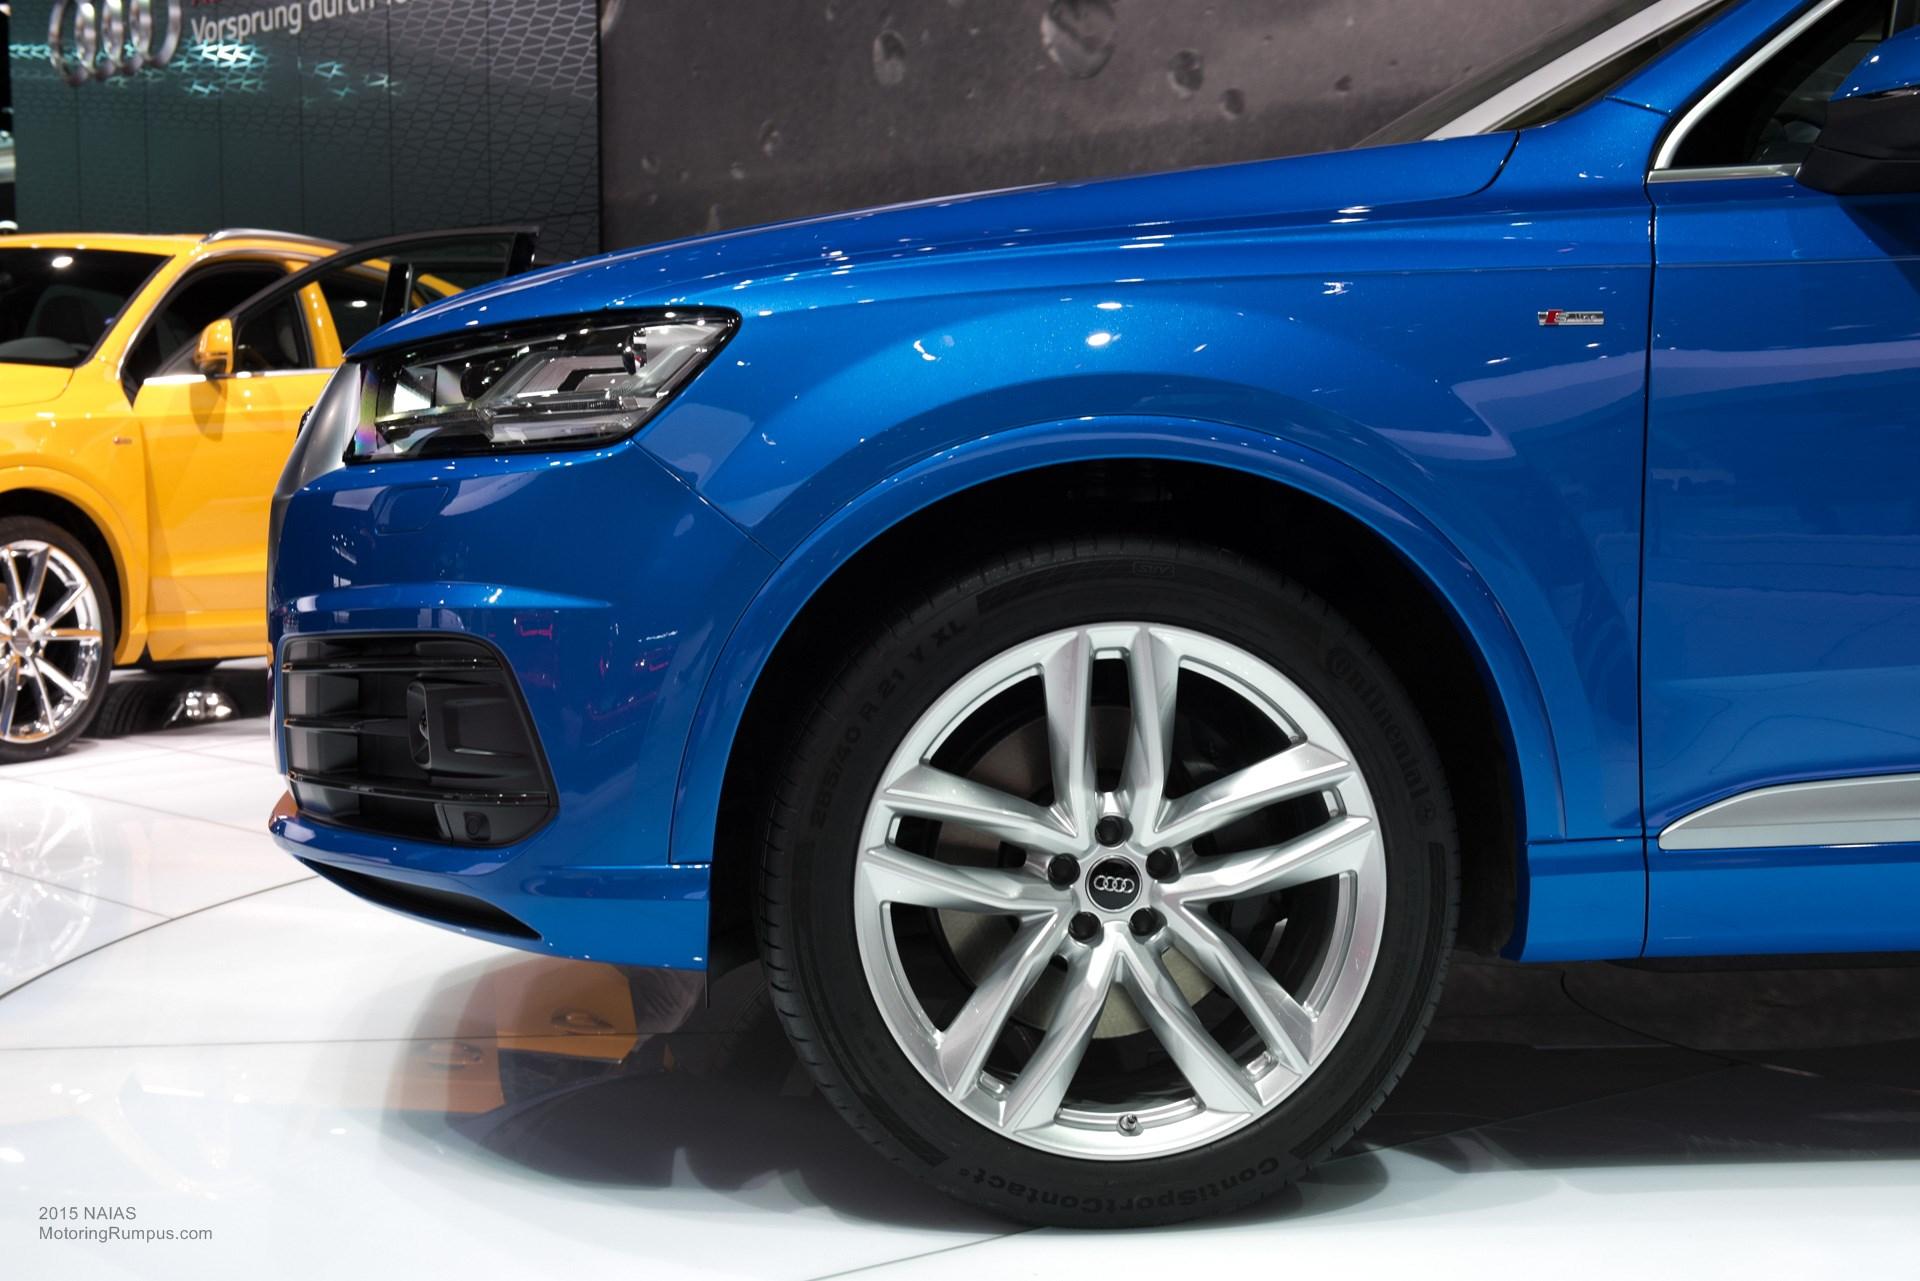 2015 Naias Audi Q7 21 Inch Wheels Motoring Rumpus